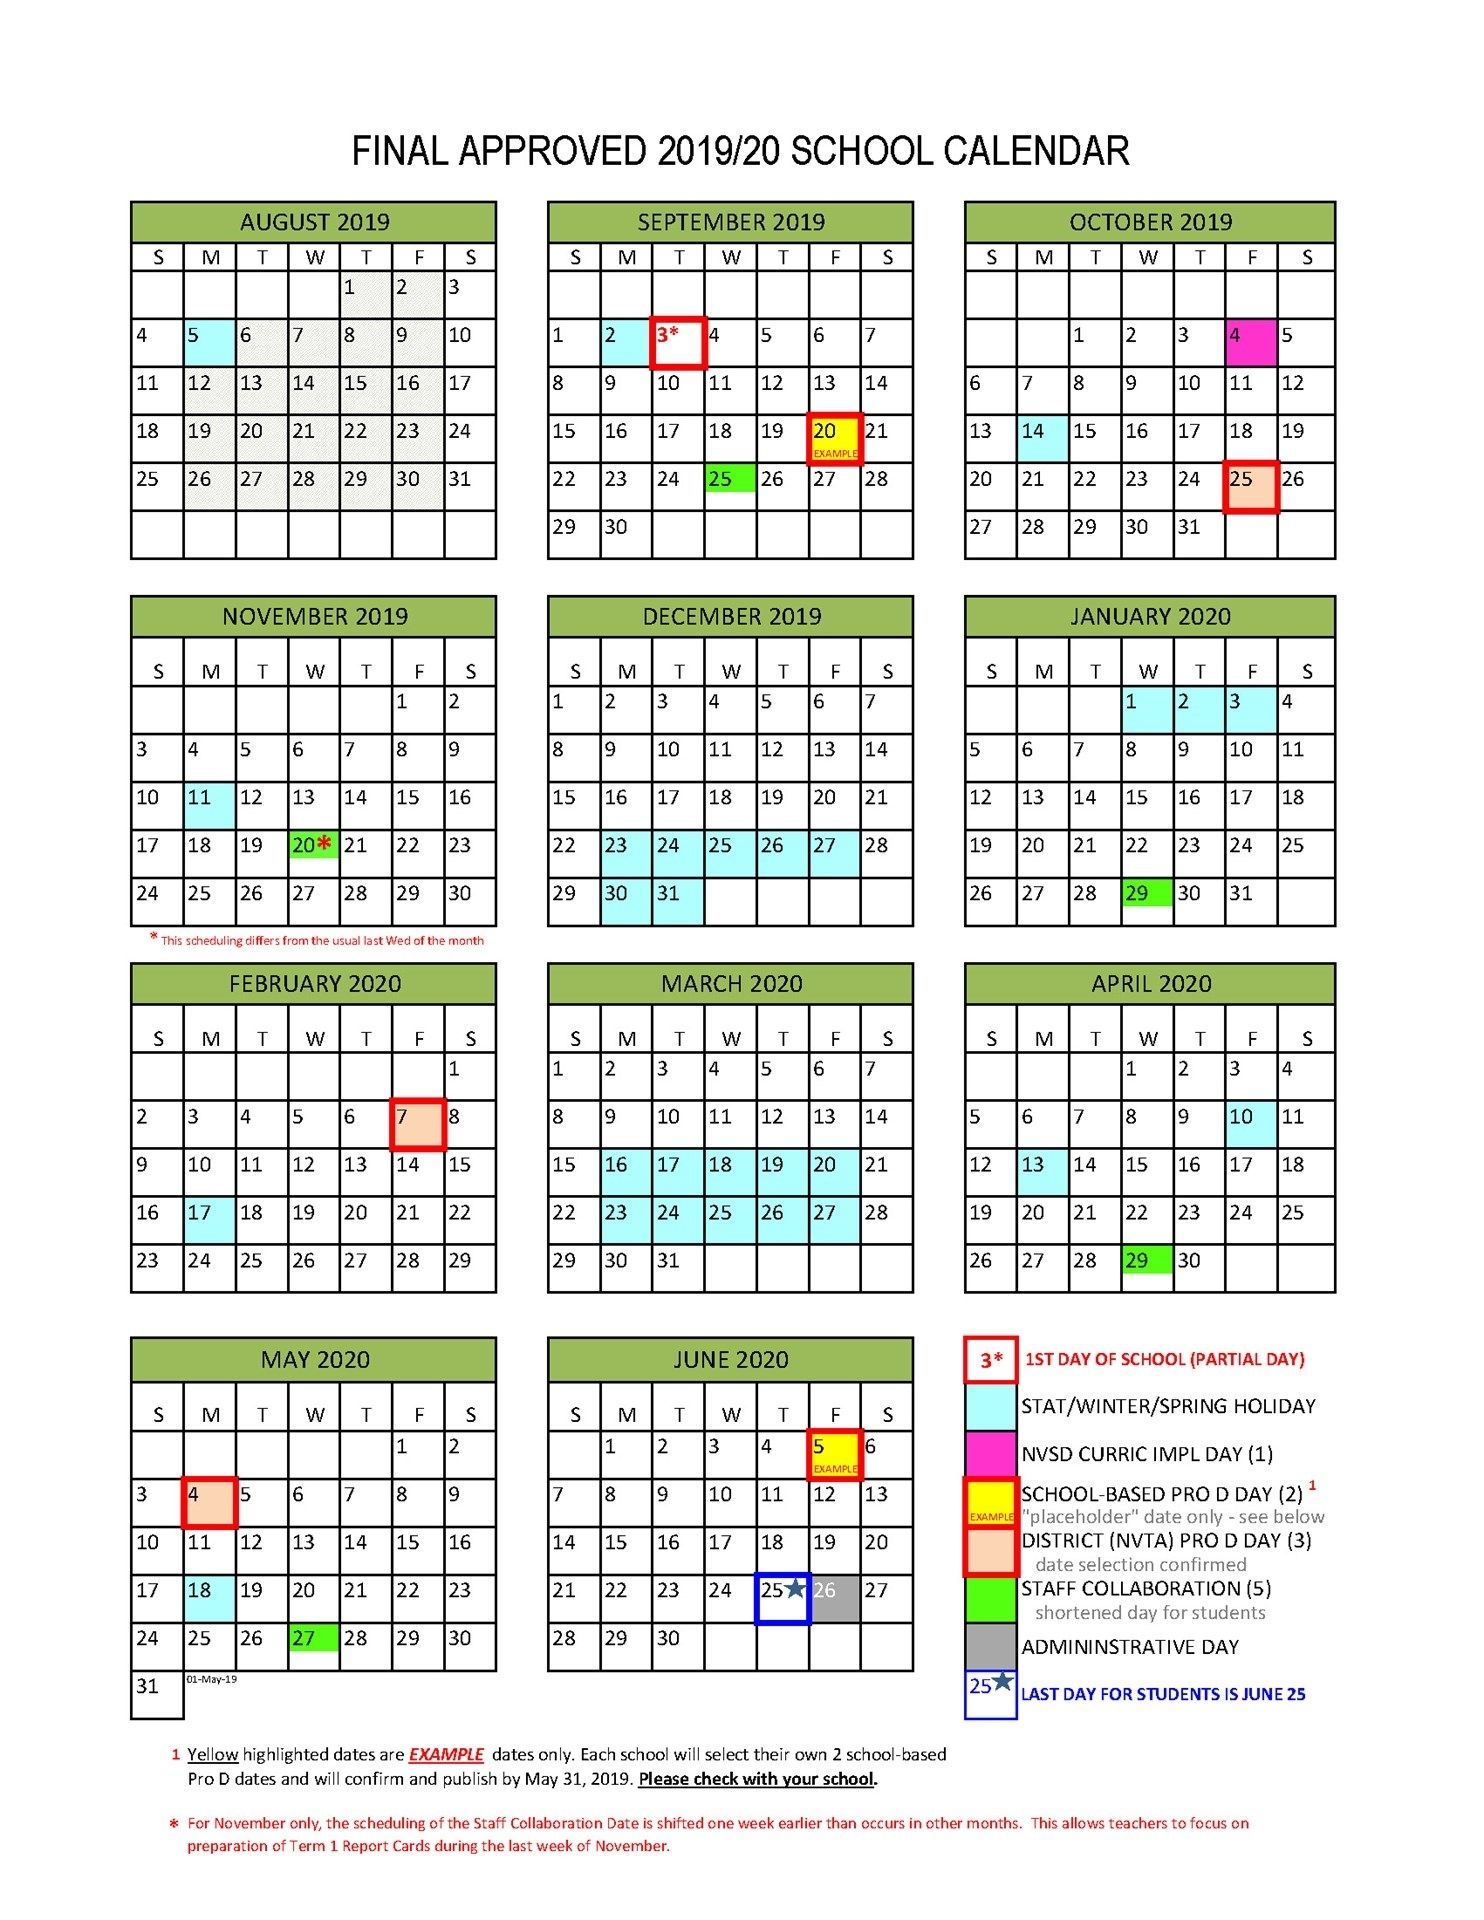 District Calendar - North Vancouver School District in Special Days Calendar 2019-2020